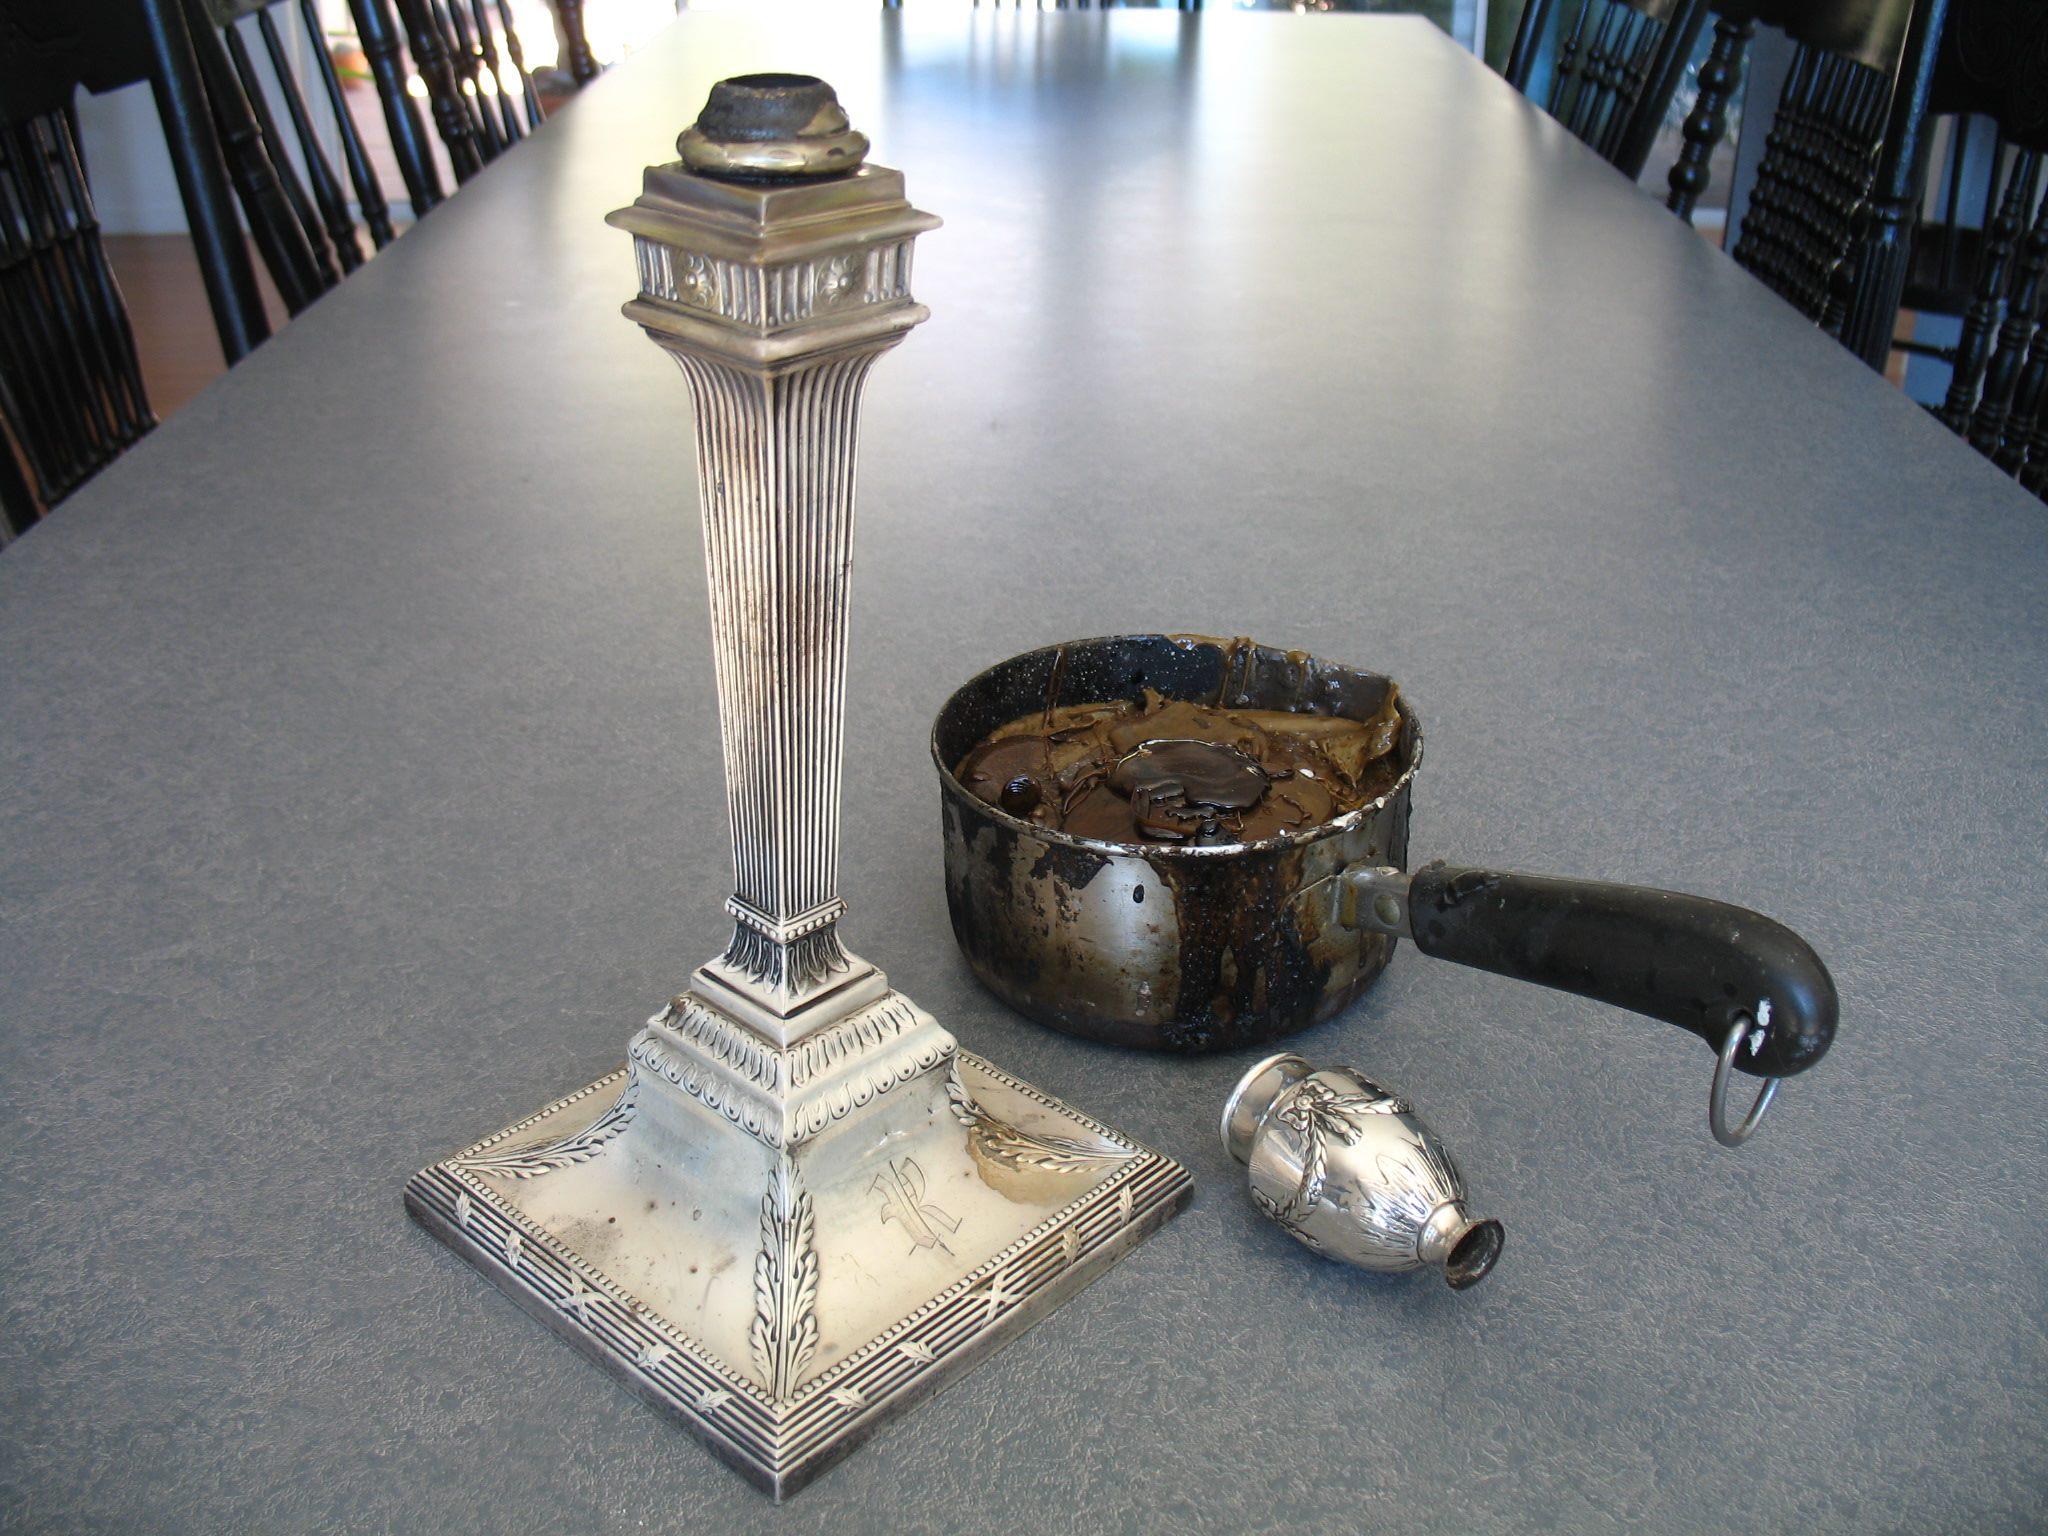 Broken 19th century silver candlestick in progress